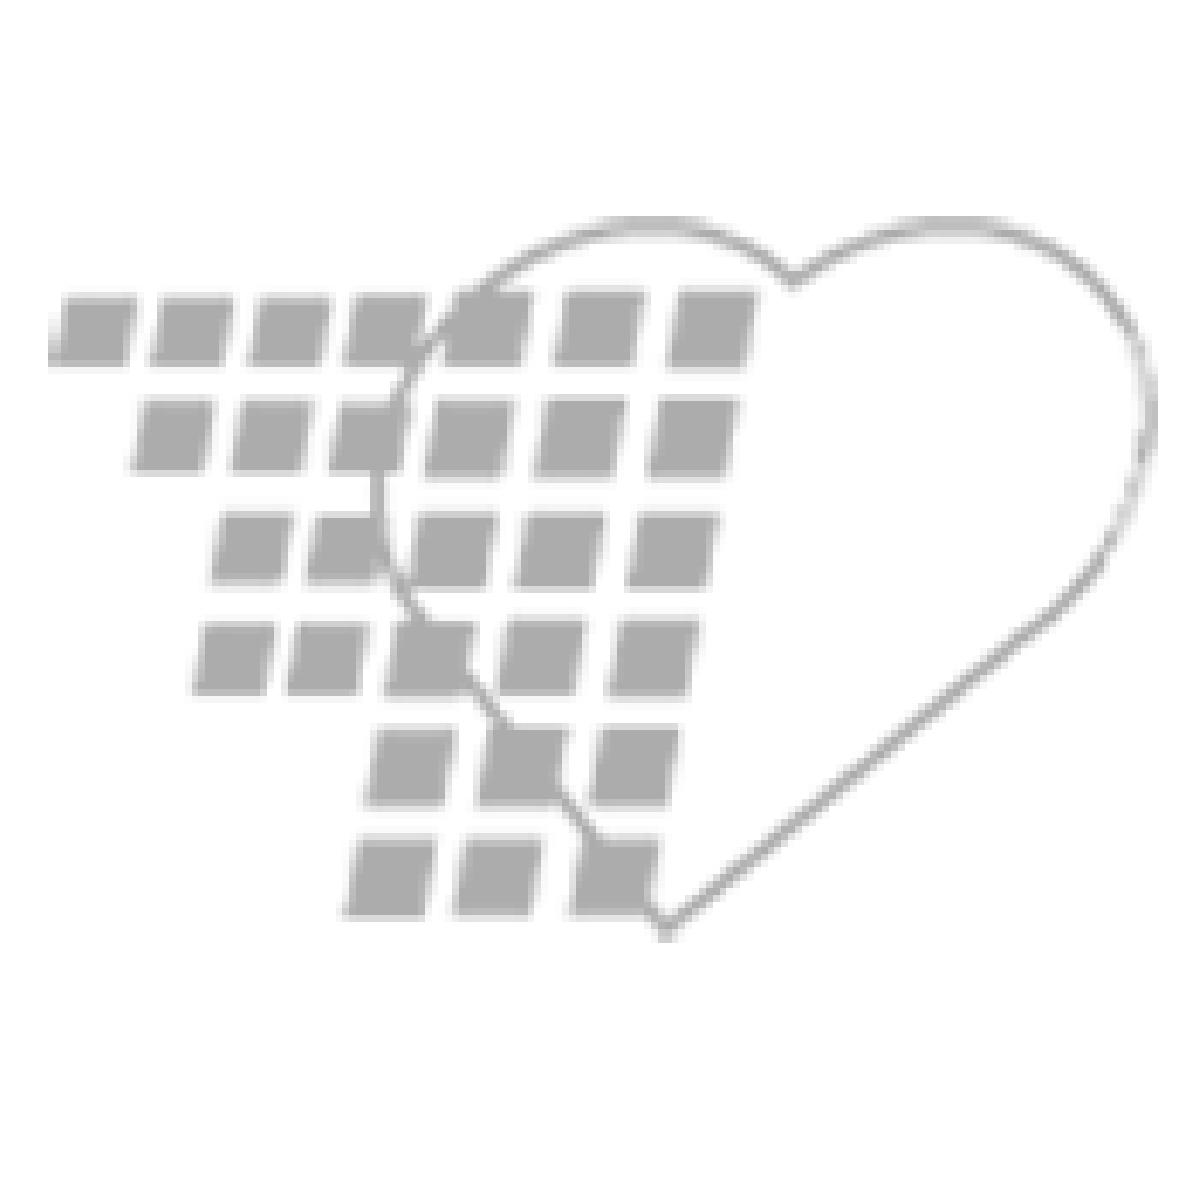 06-44-9901P Pocket Nurse® Prefilled Crash Cart Drawer Insert